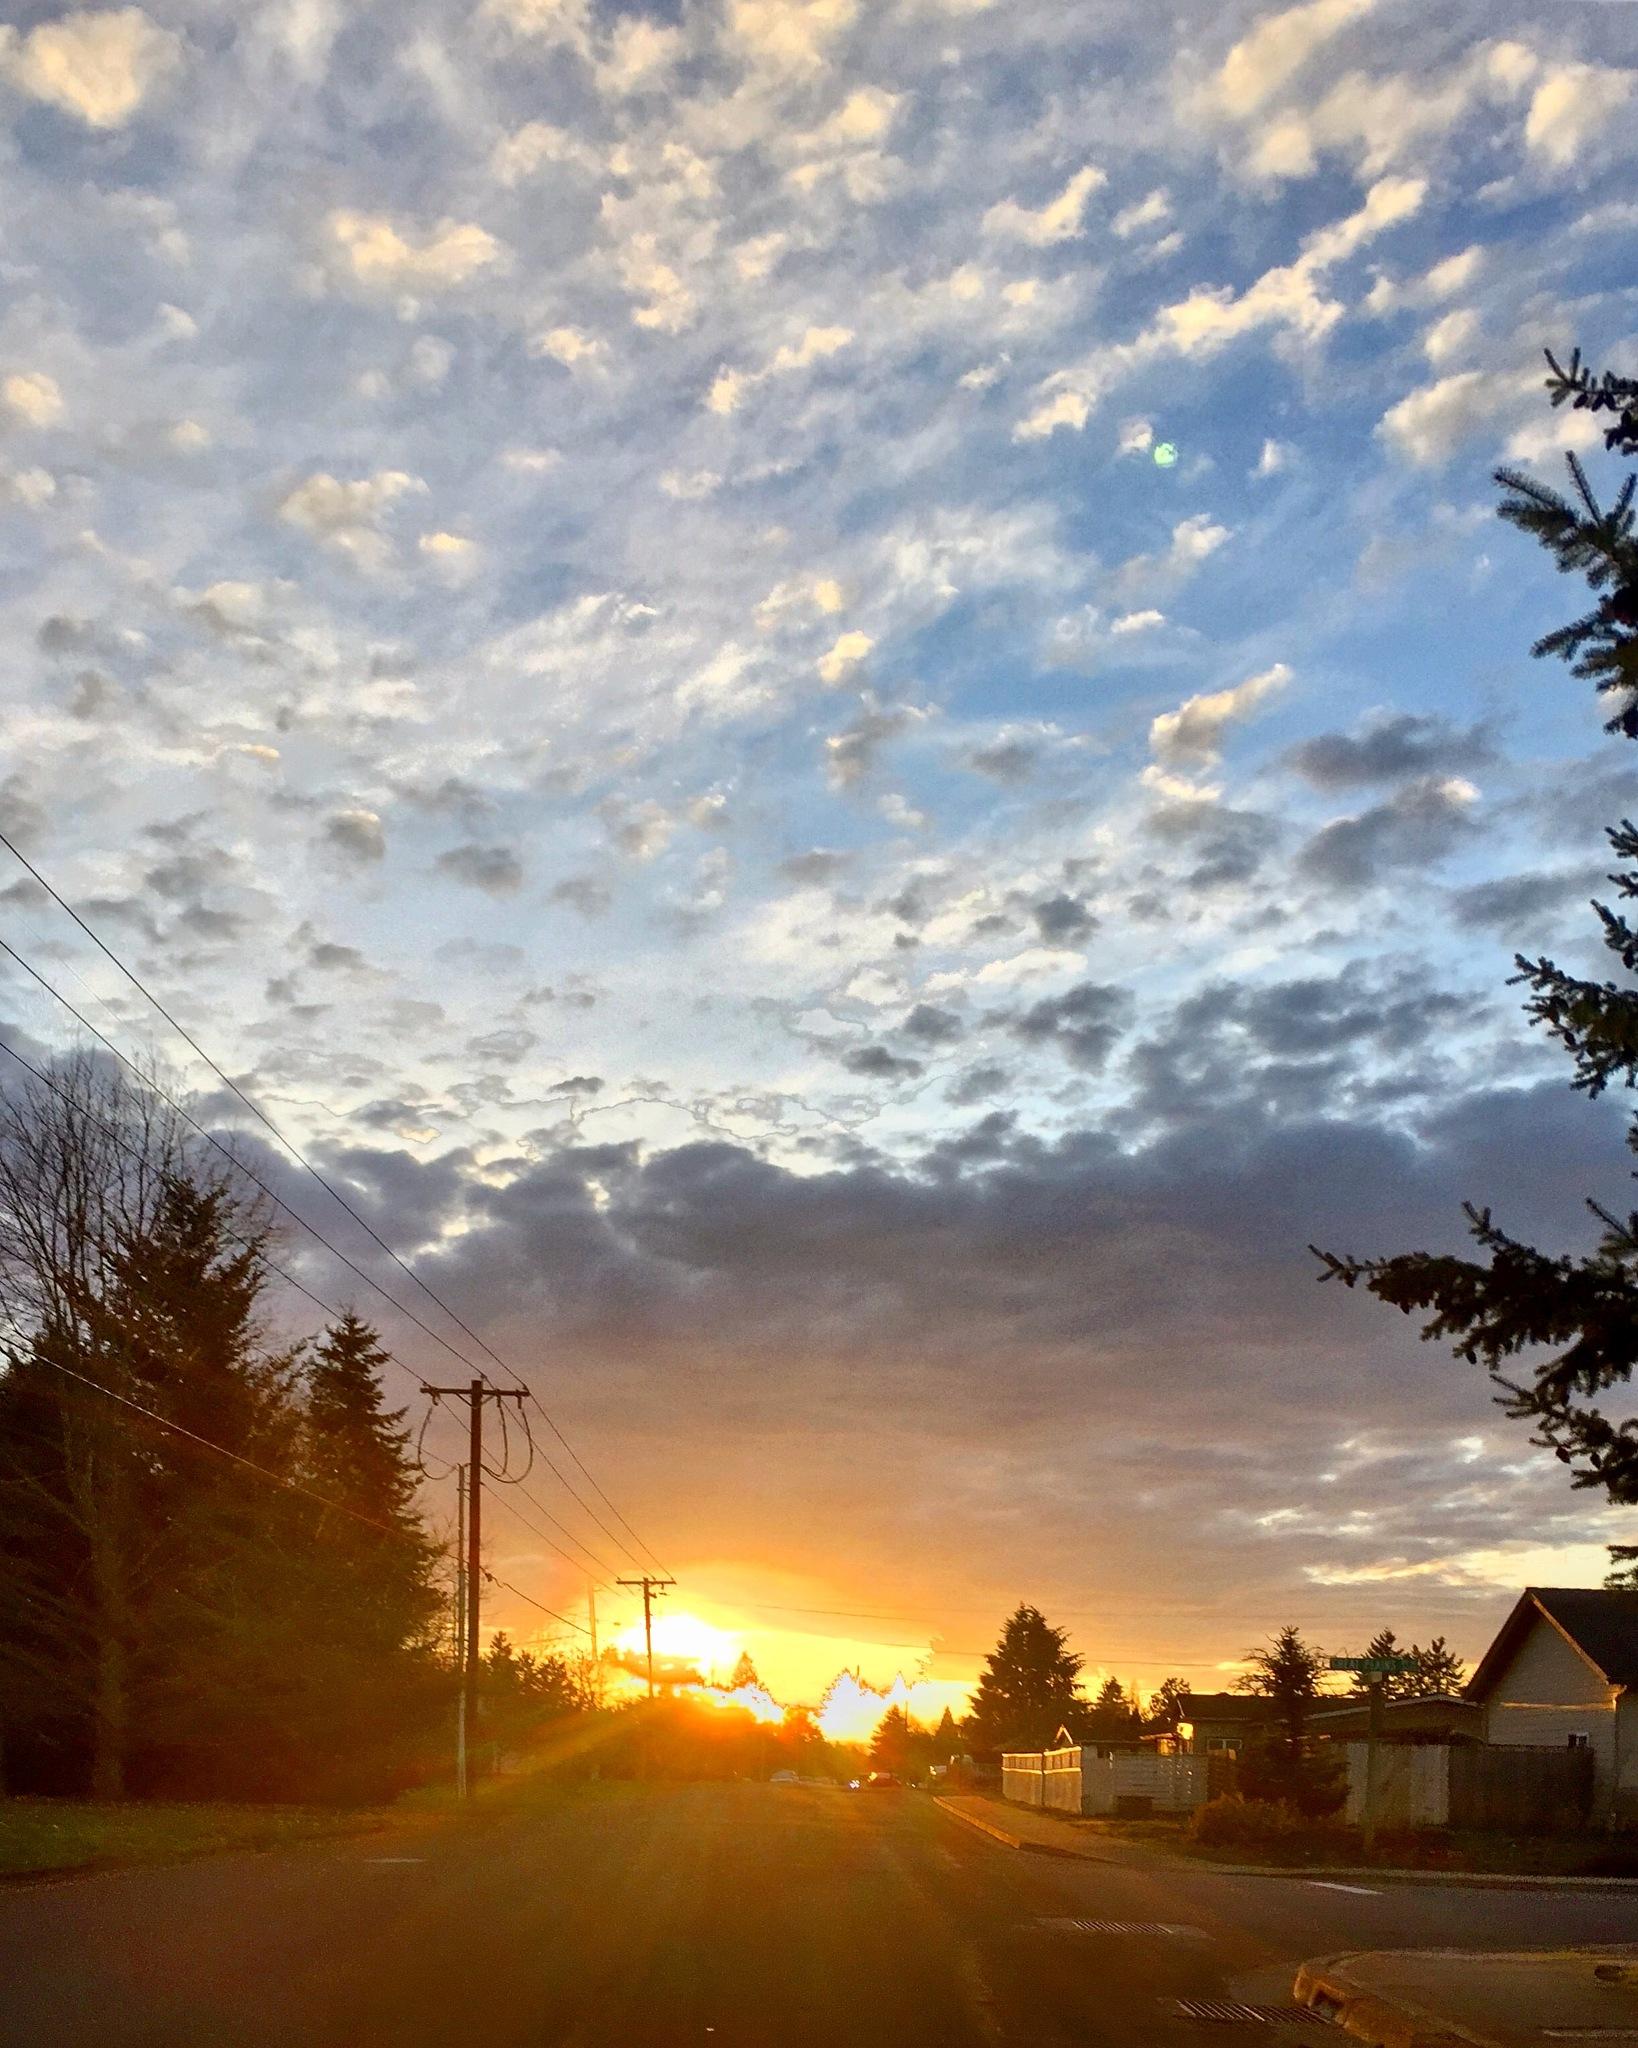 Cloudy Sunset  by Ngoc-Tram Tran